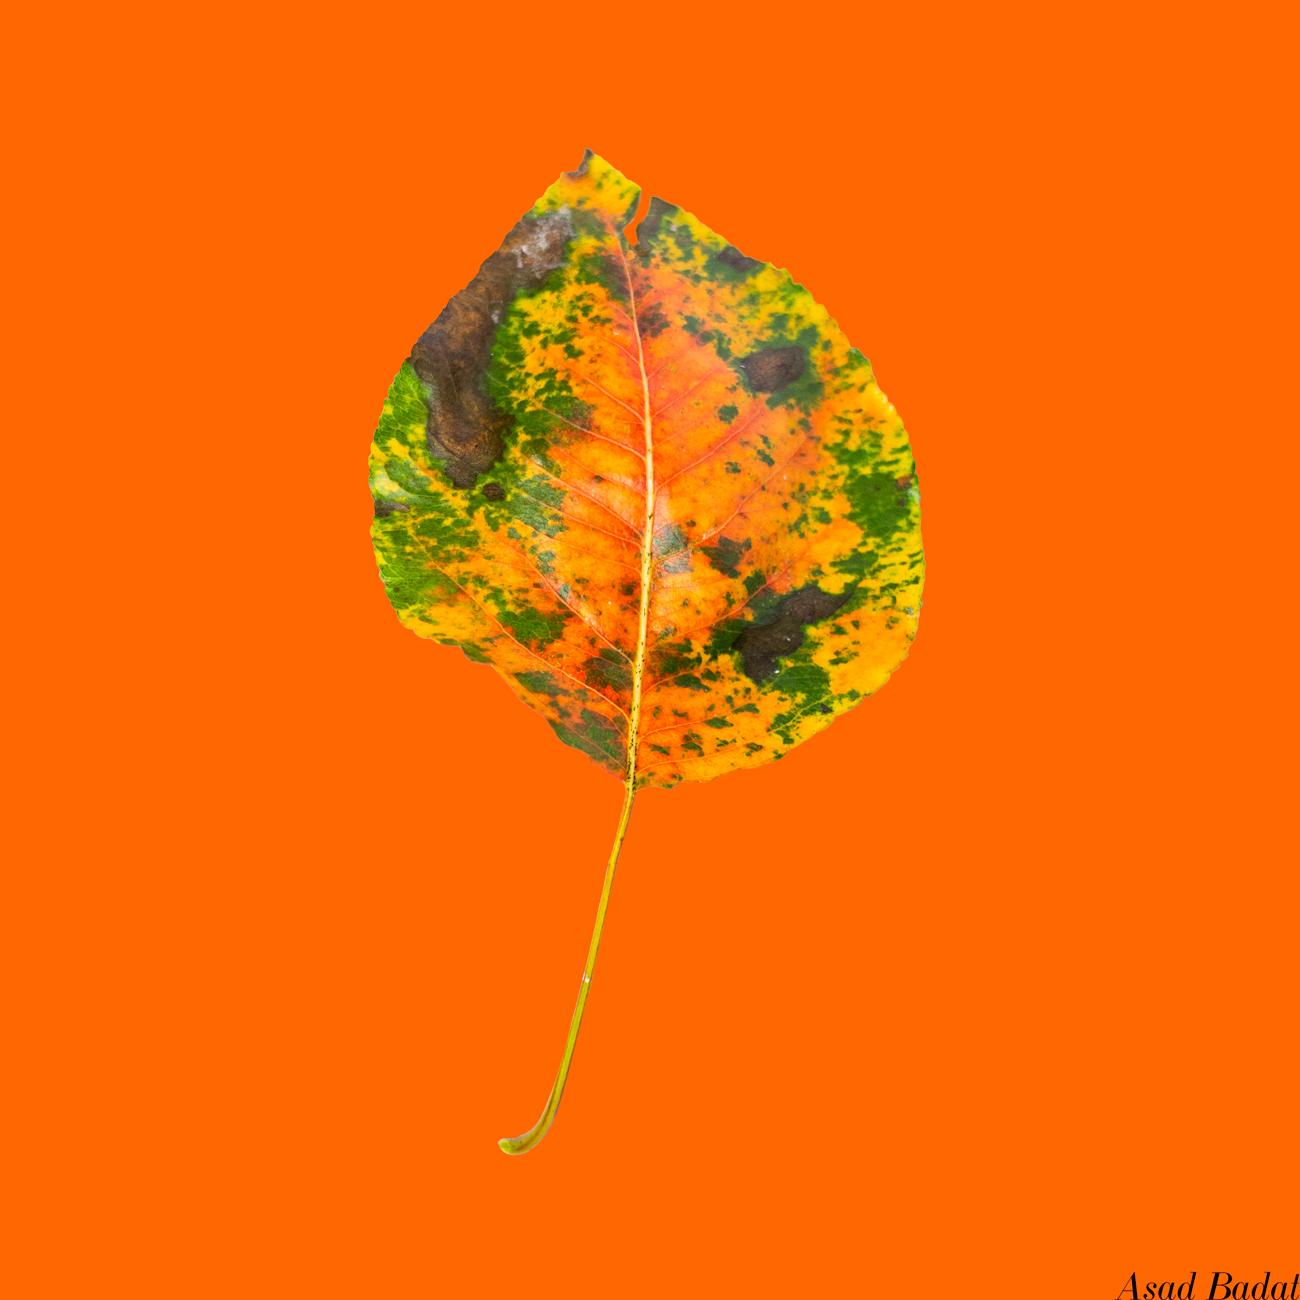 Asad-Badat-Autumn-Leaves.jpg